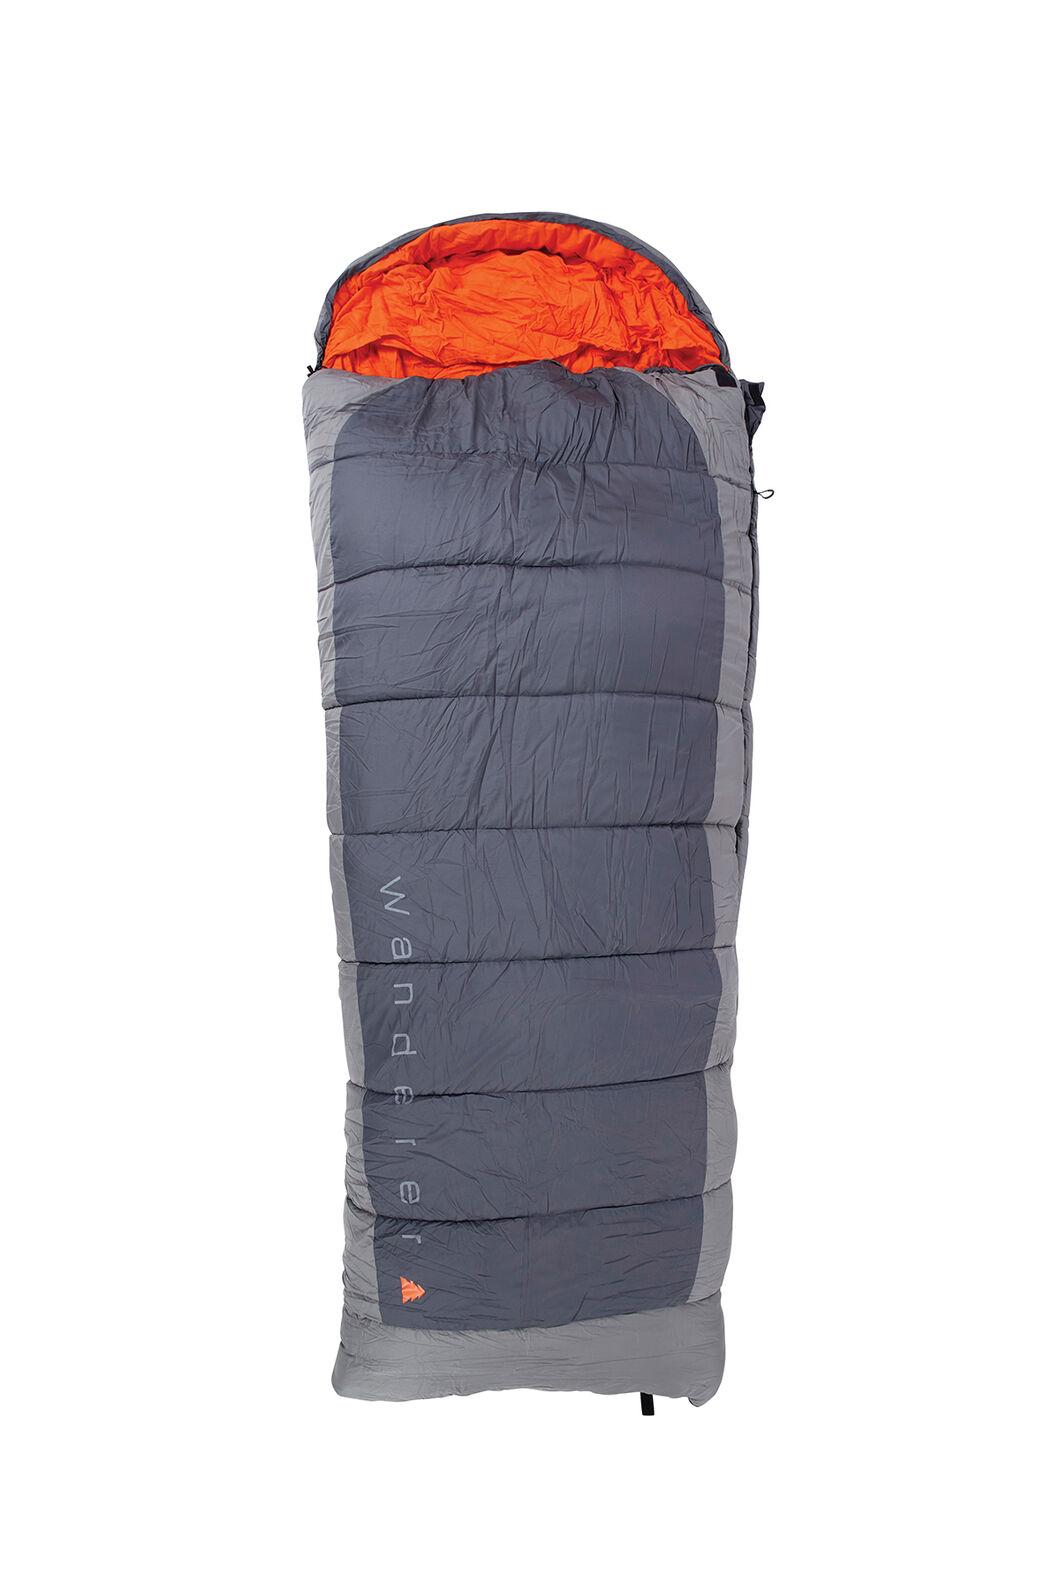 Wanderer Full Flame Hooded Sleeping Bag, None, hi-res